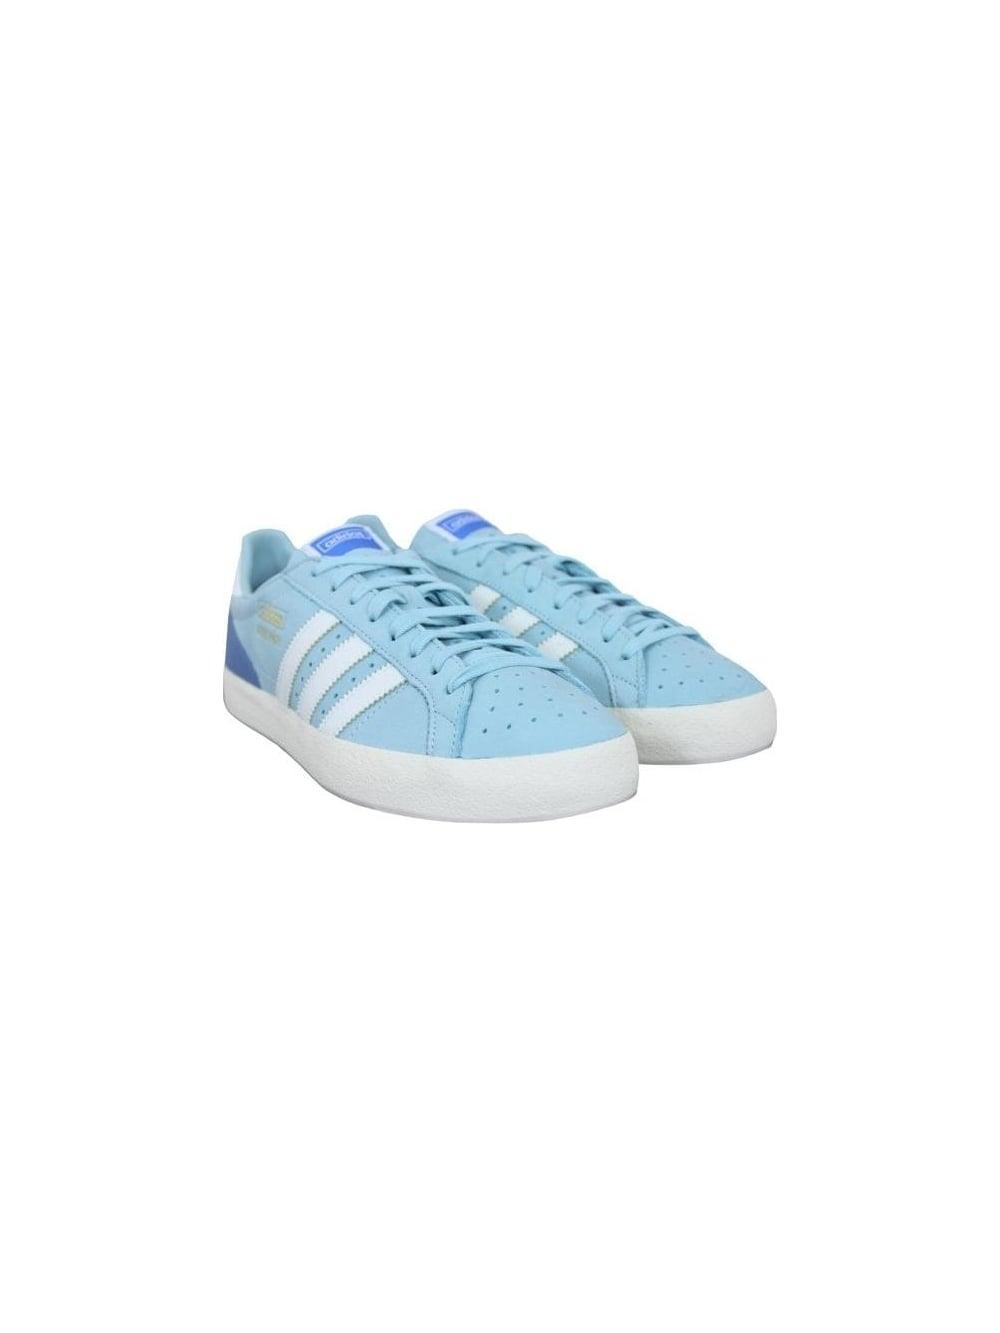 online store 6e7d1 aa404 Basket Profi OG LO Trainers - Clear Green